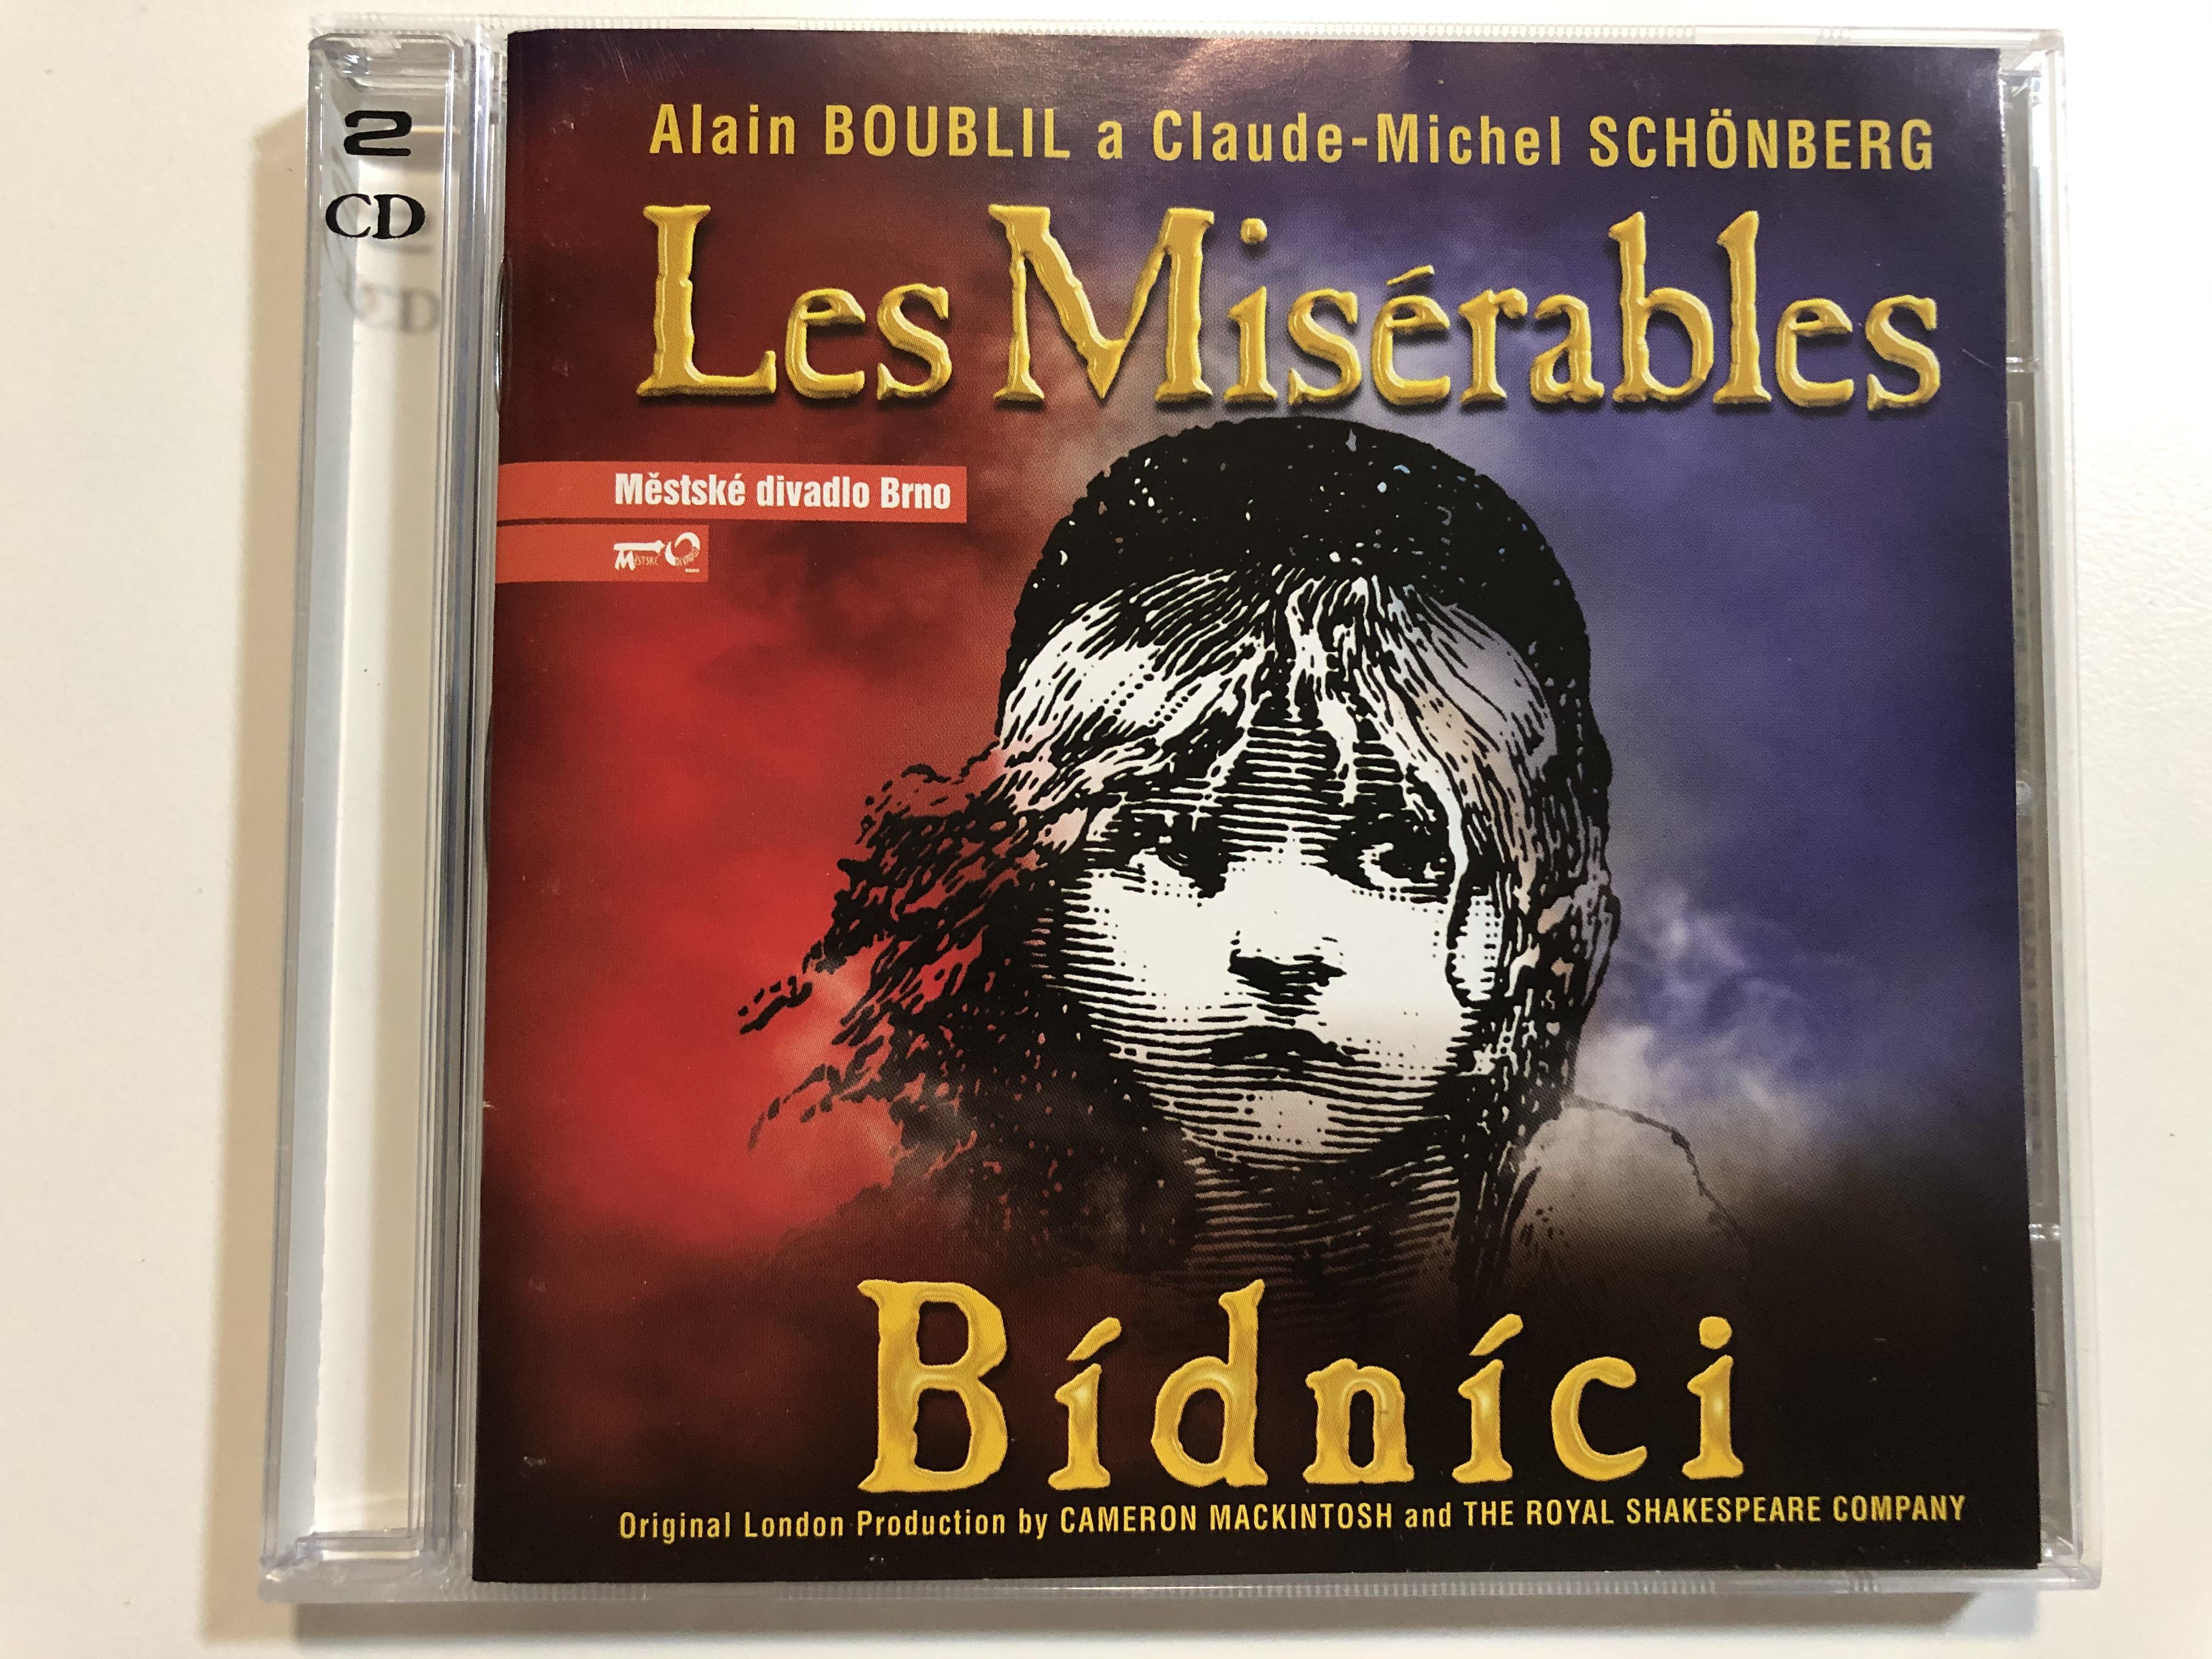 alain-boublil-a-claude-michel-schonberg-les-miserables-bidnici-original-london-production-by-cameron-mackintosh-and-royal-shakespeare-company-mestske-divadlo-brno-2x-audio-cd-1-.jpg